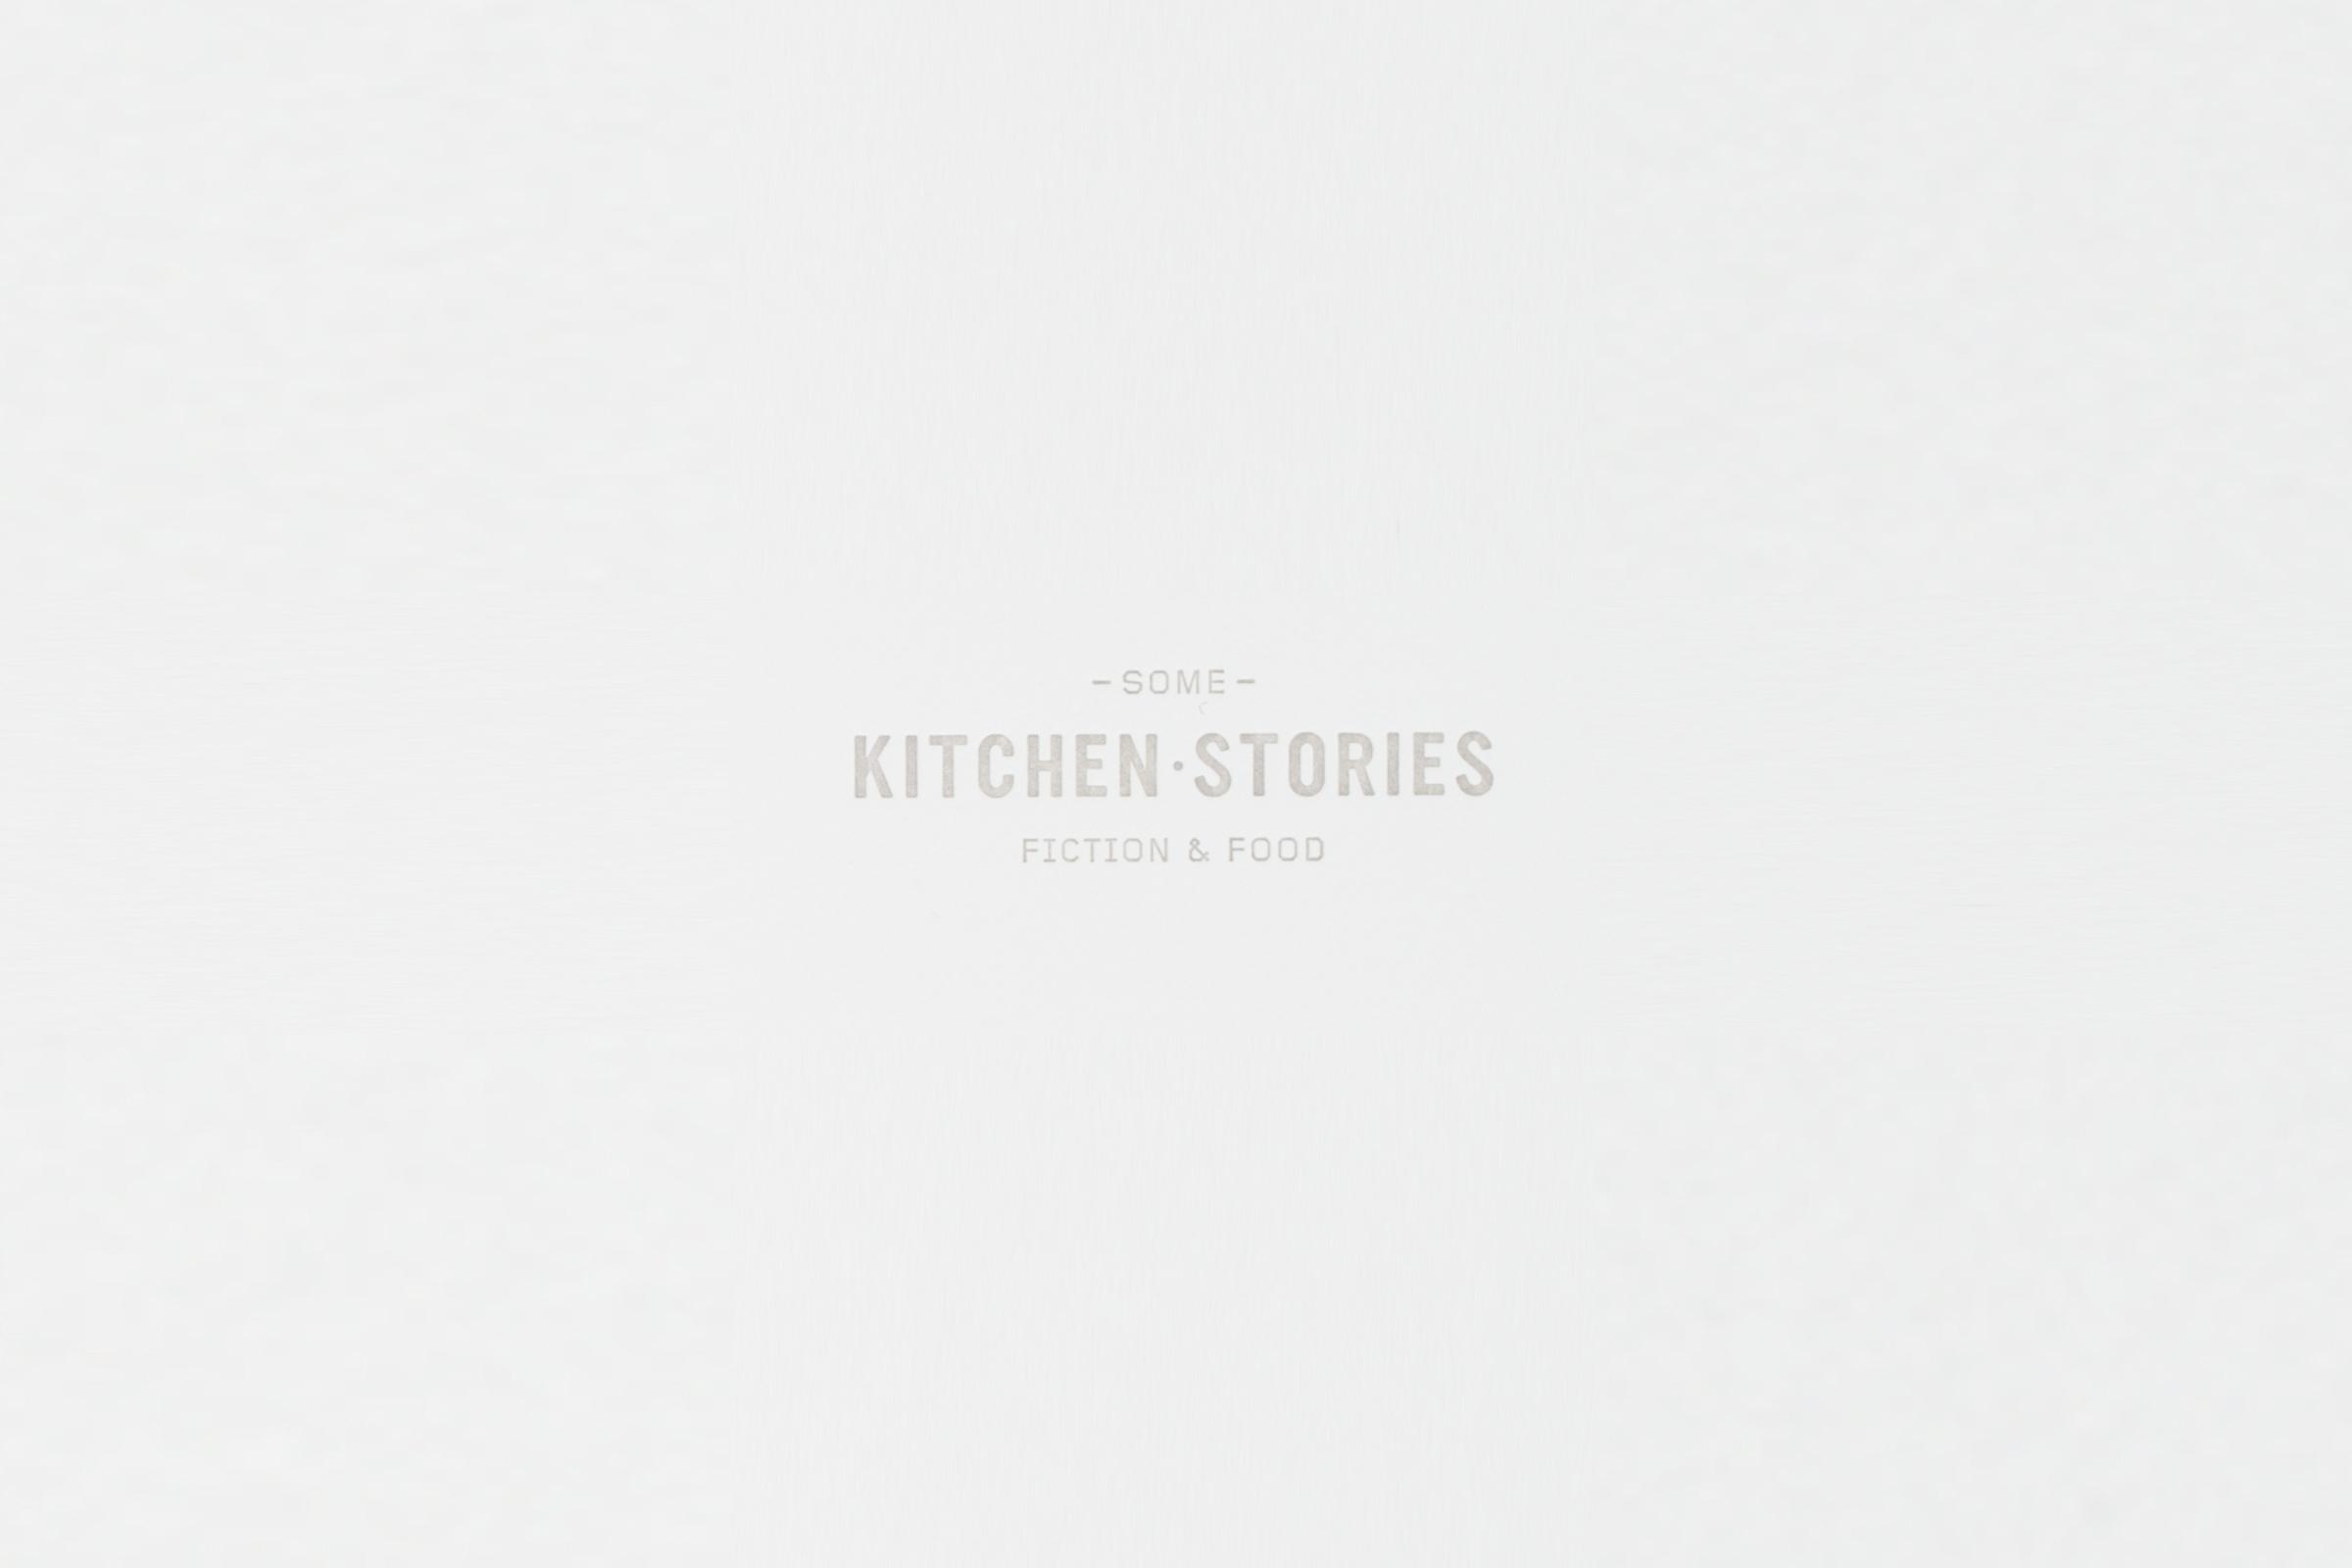 SomeKitchenStories_Branding_8.jpg